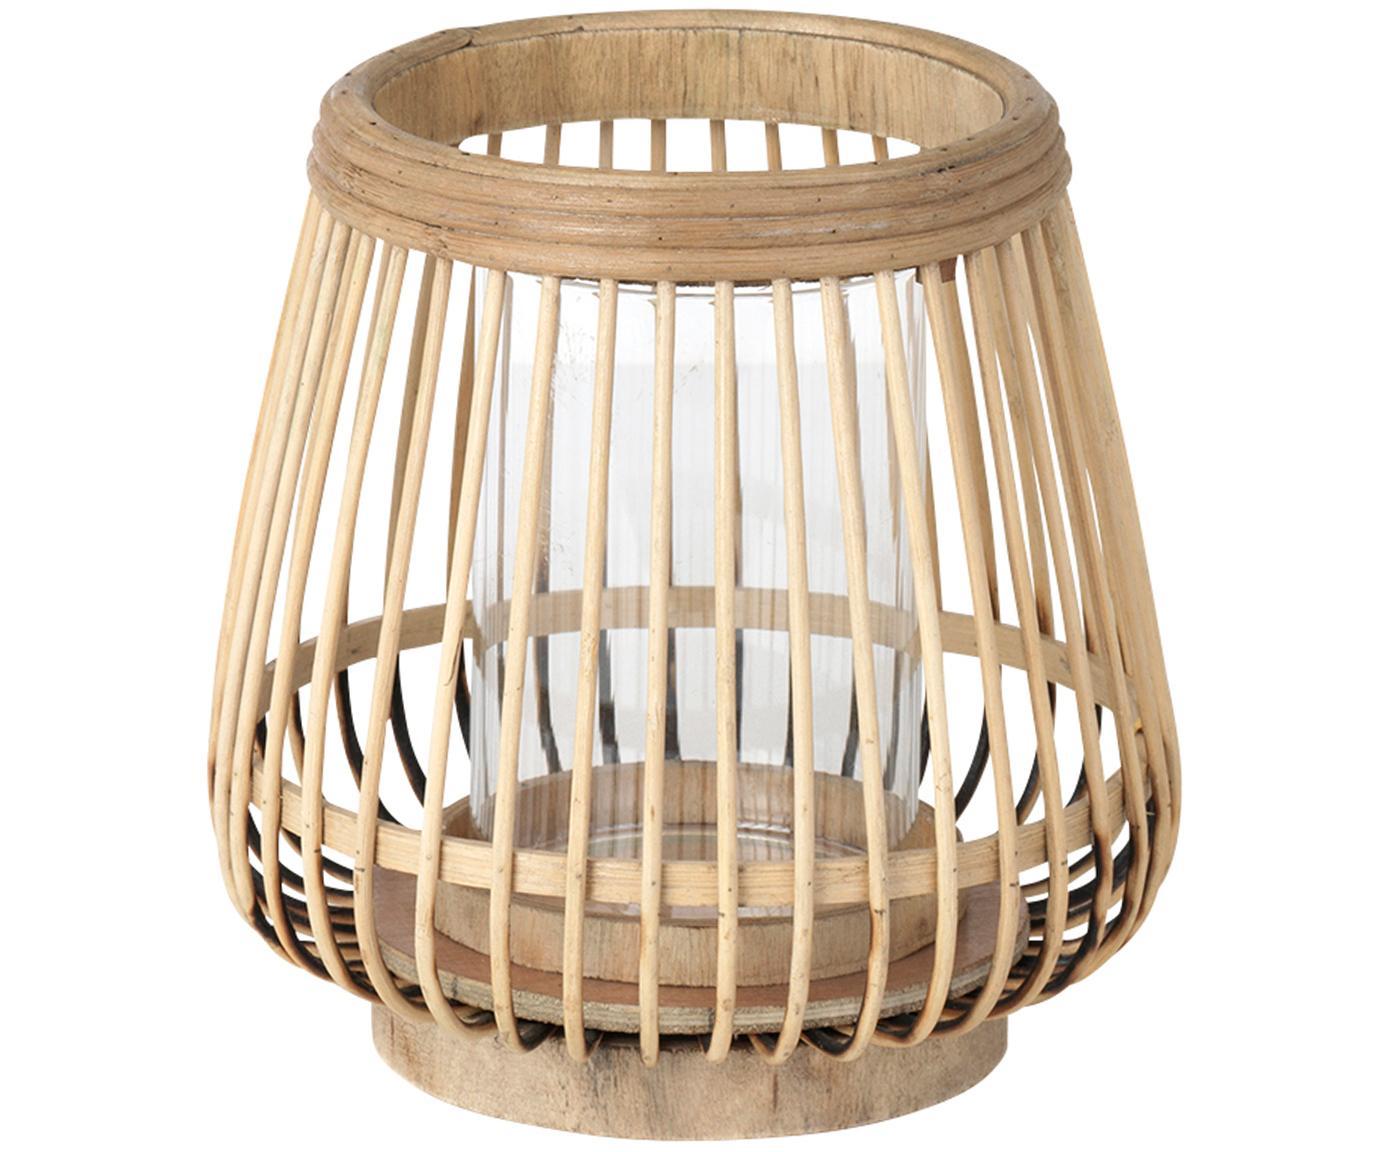 Portacandela Caits, Portacandela: legno di bambù, Portacandela: marrone chiaro Cilindro: trasparente, Ø 21 x Alt. 22 cm